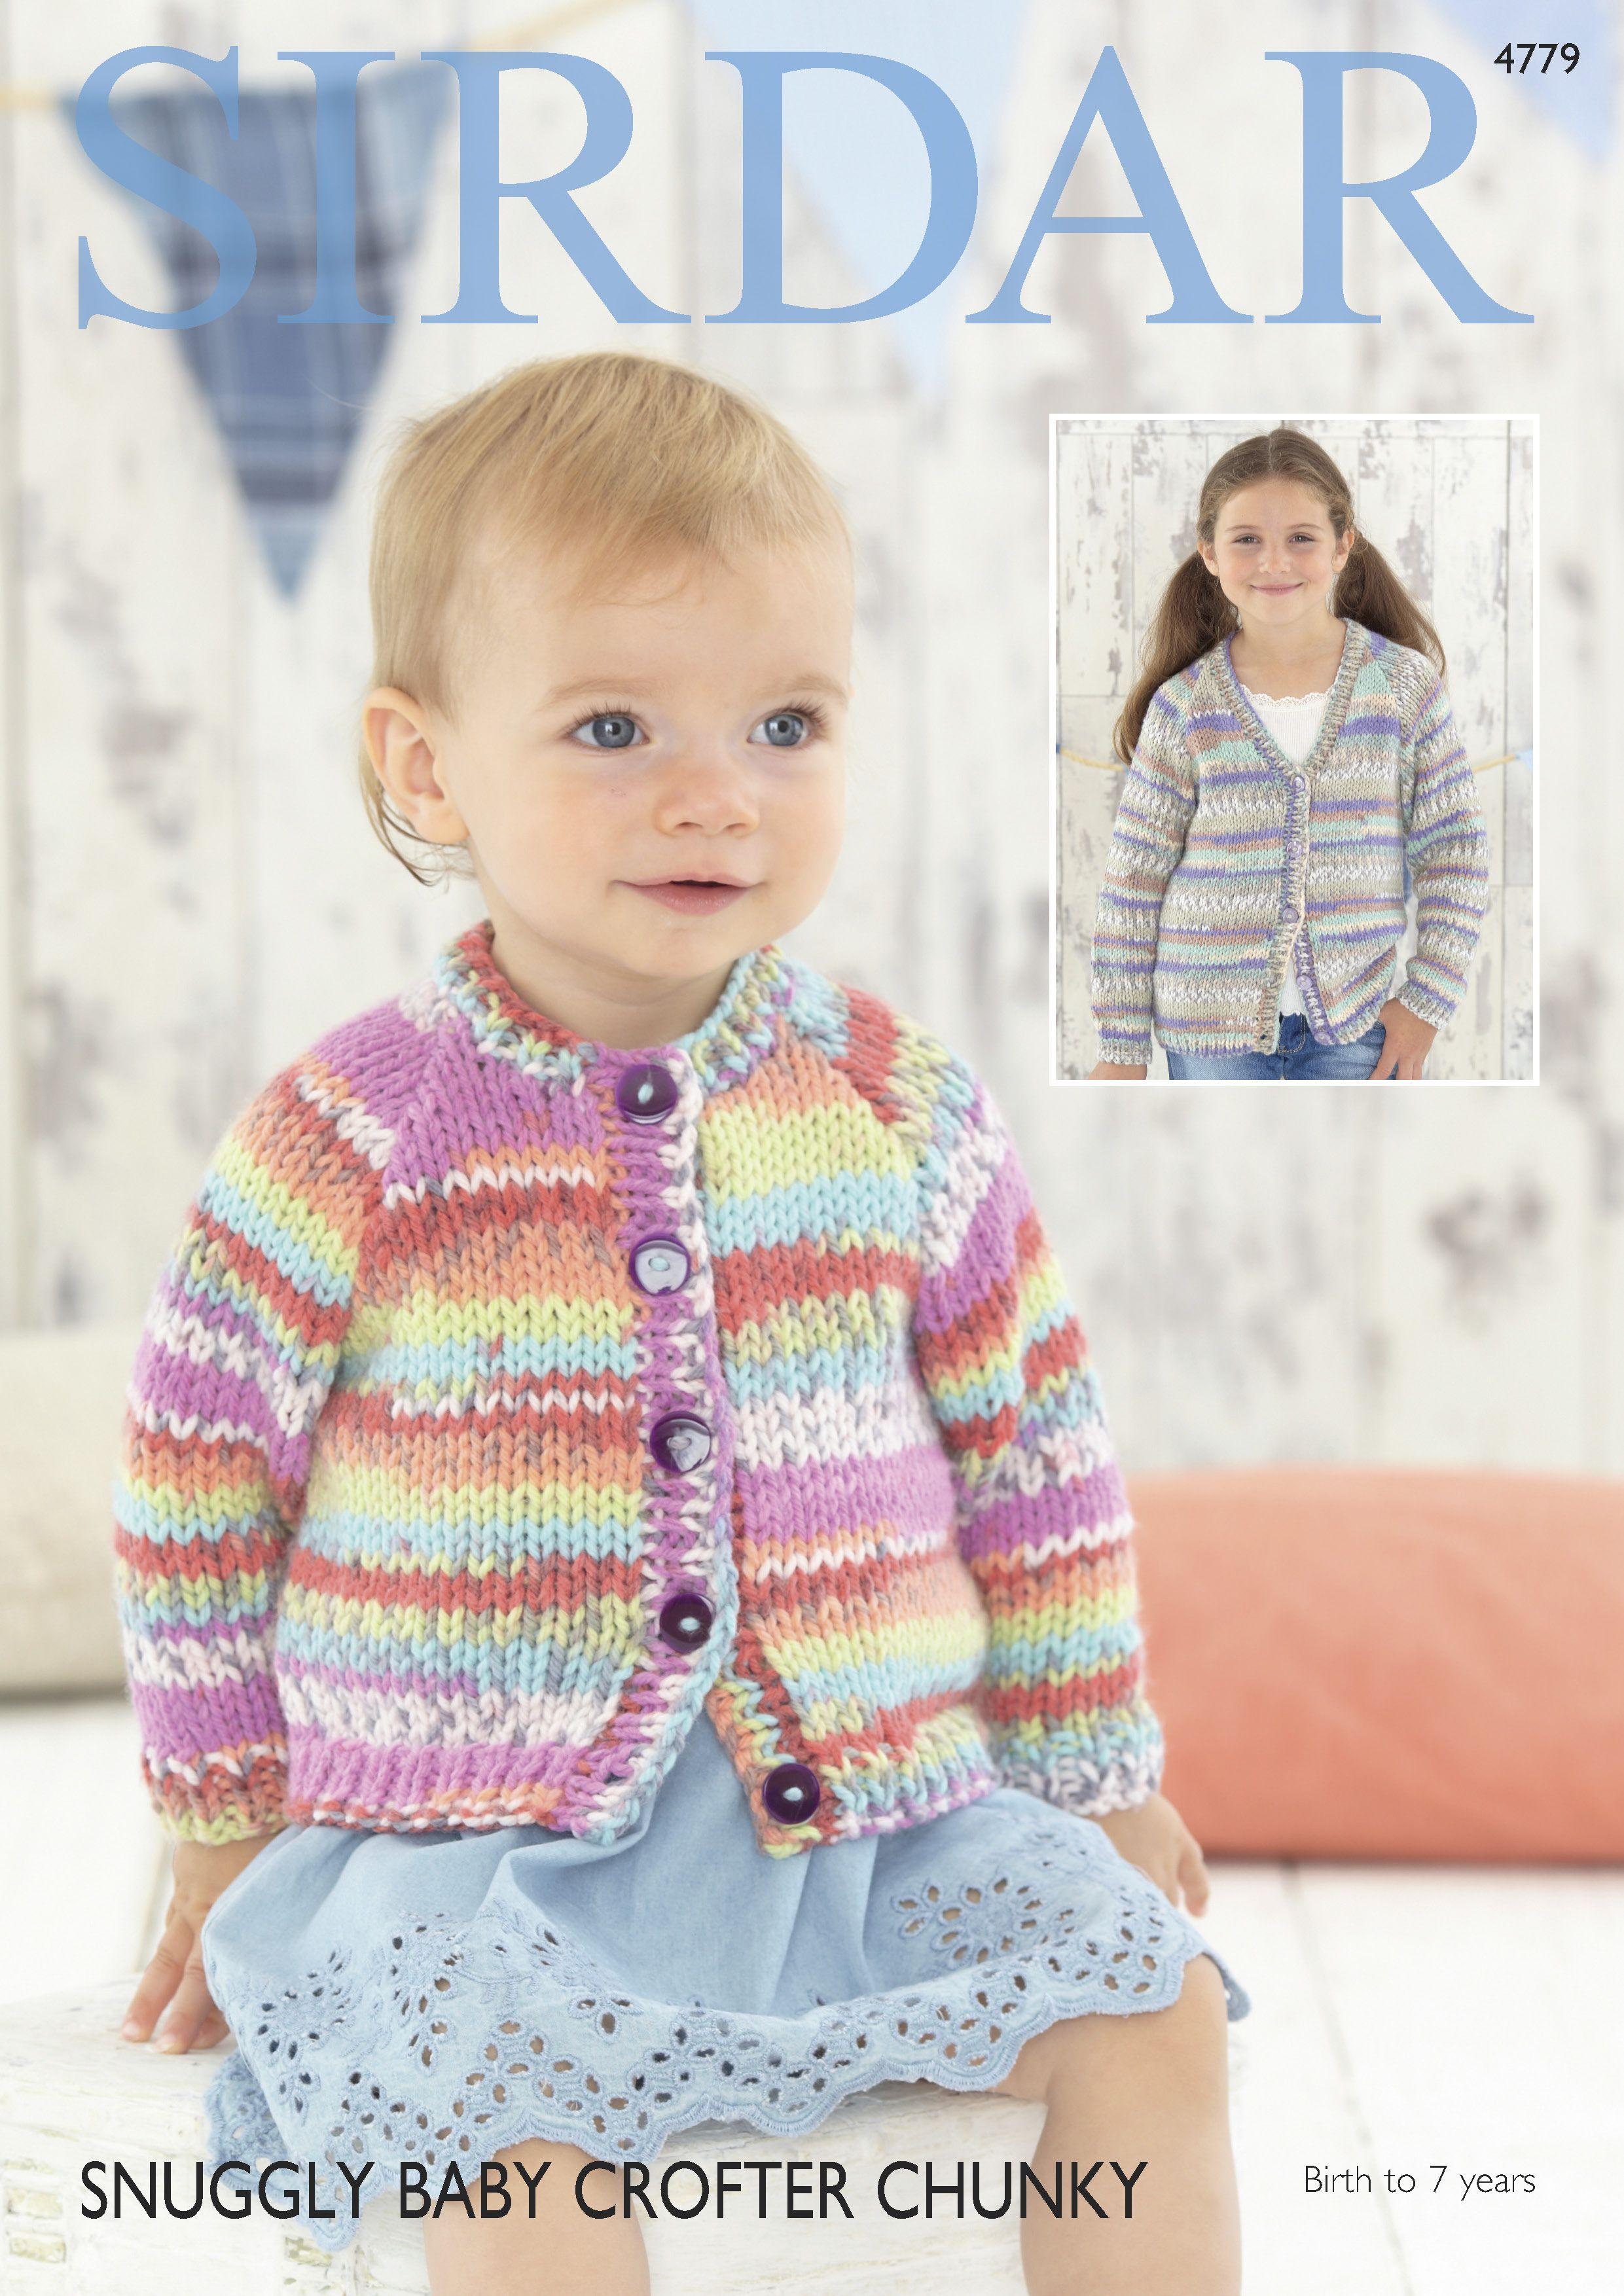 c0bb5192c66d Sirdar Snuggly Baby Crofter Chunky Cardigan Pattern 4779